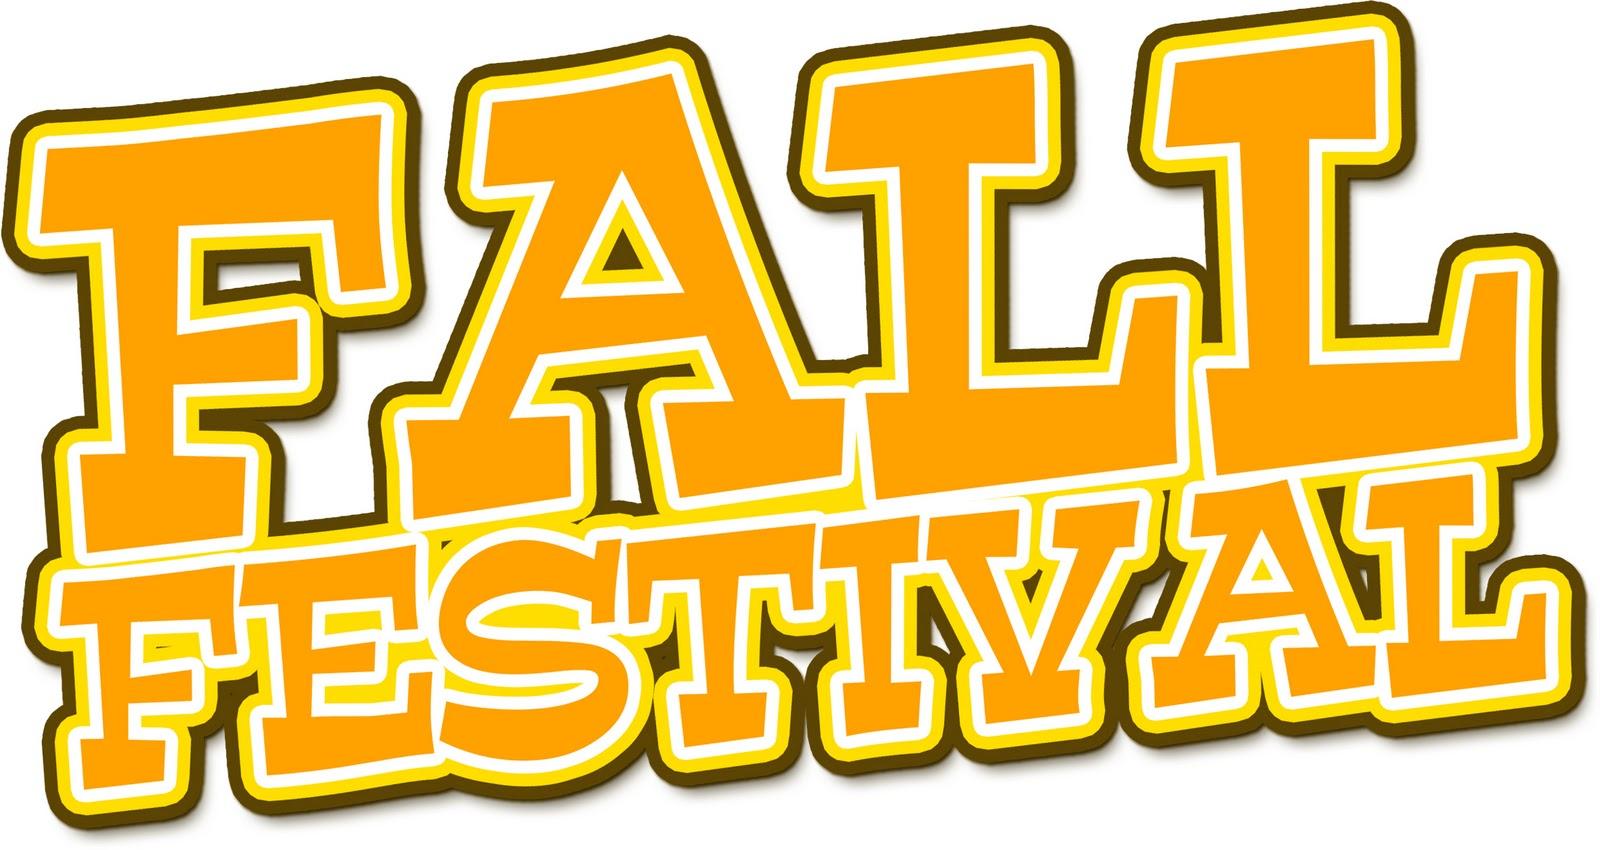 fallfestival_logo1